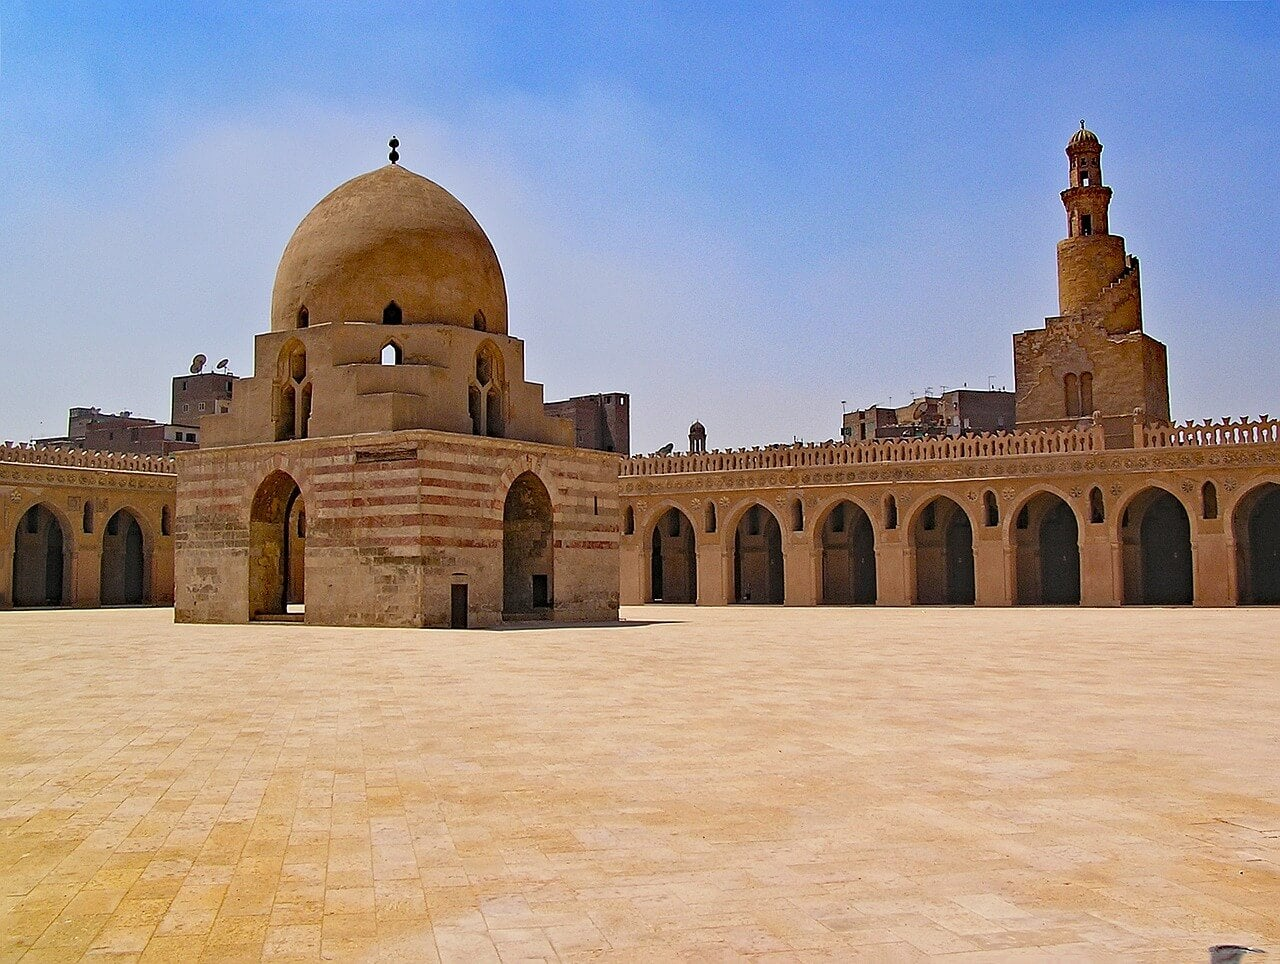 Mezquita Ibn Tulum en El Cairo